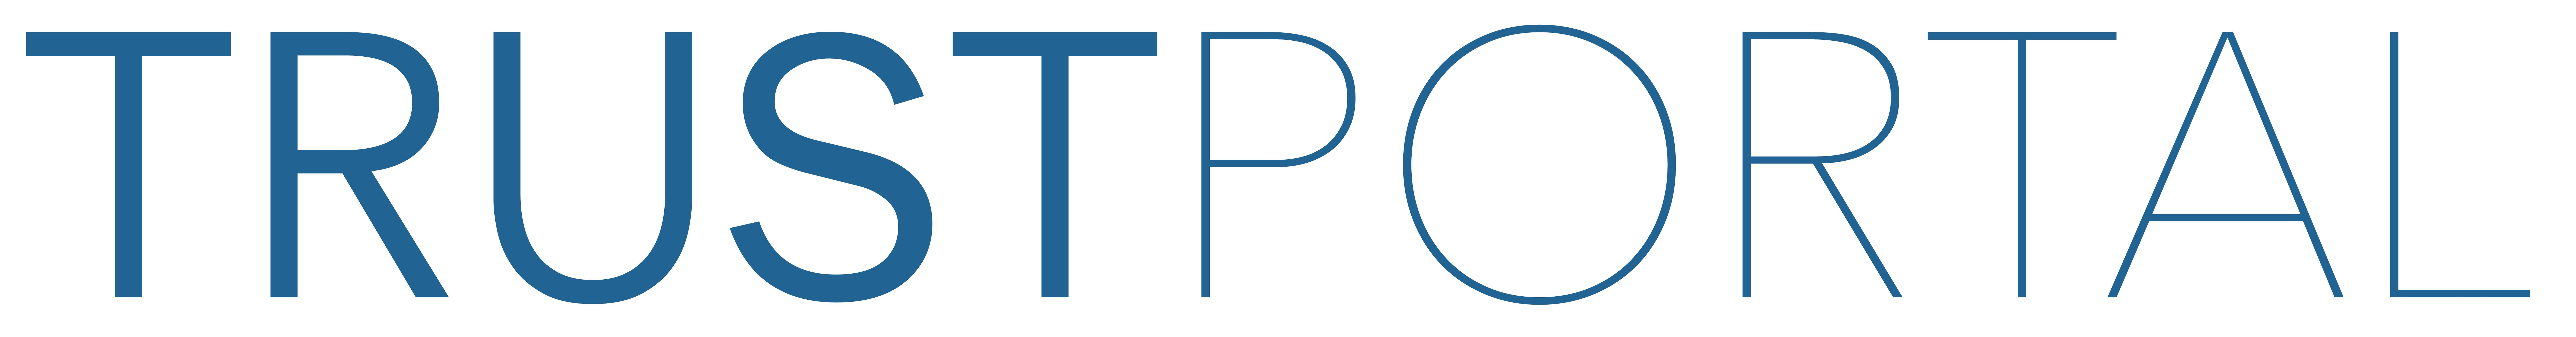 TrustPortal Technology